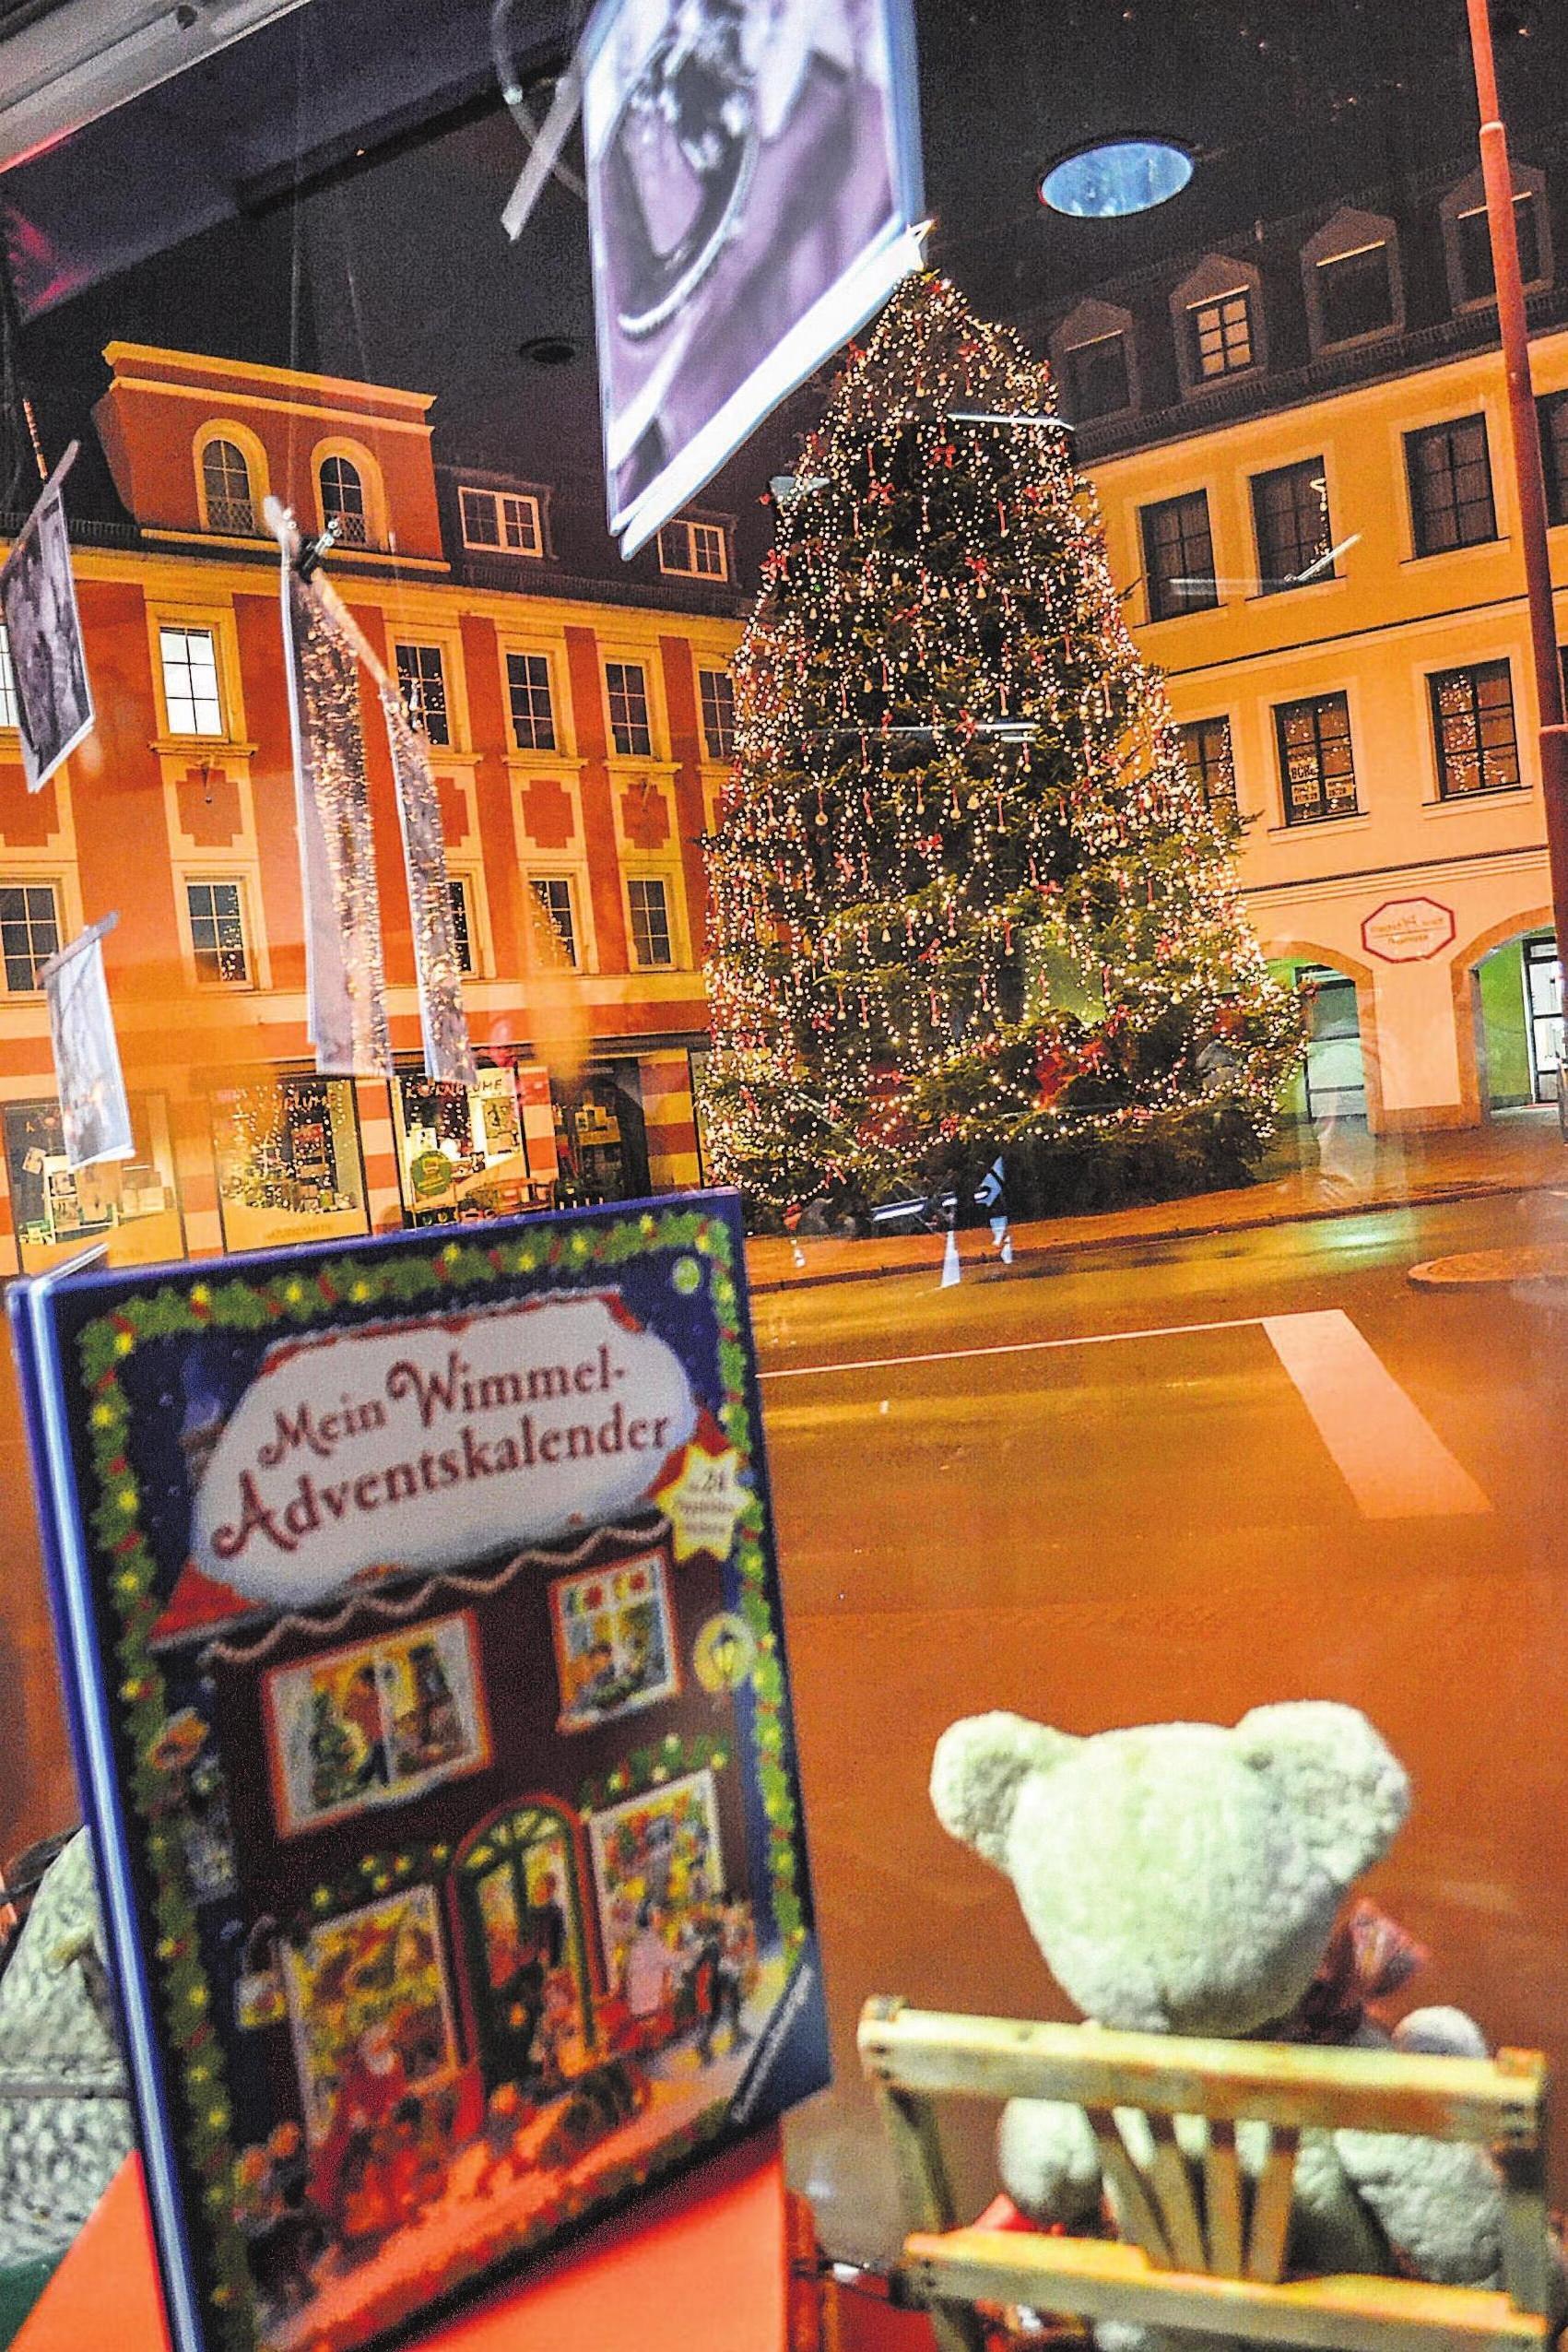 "Das Haus am Marktplatz 1, Heimat der ""SelbKultur"", ist auch zur Weihnachtszeit liebevoll geschmückt. Fotos: Silke Meier"